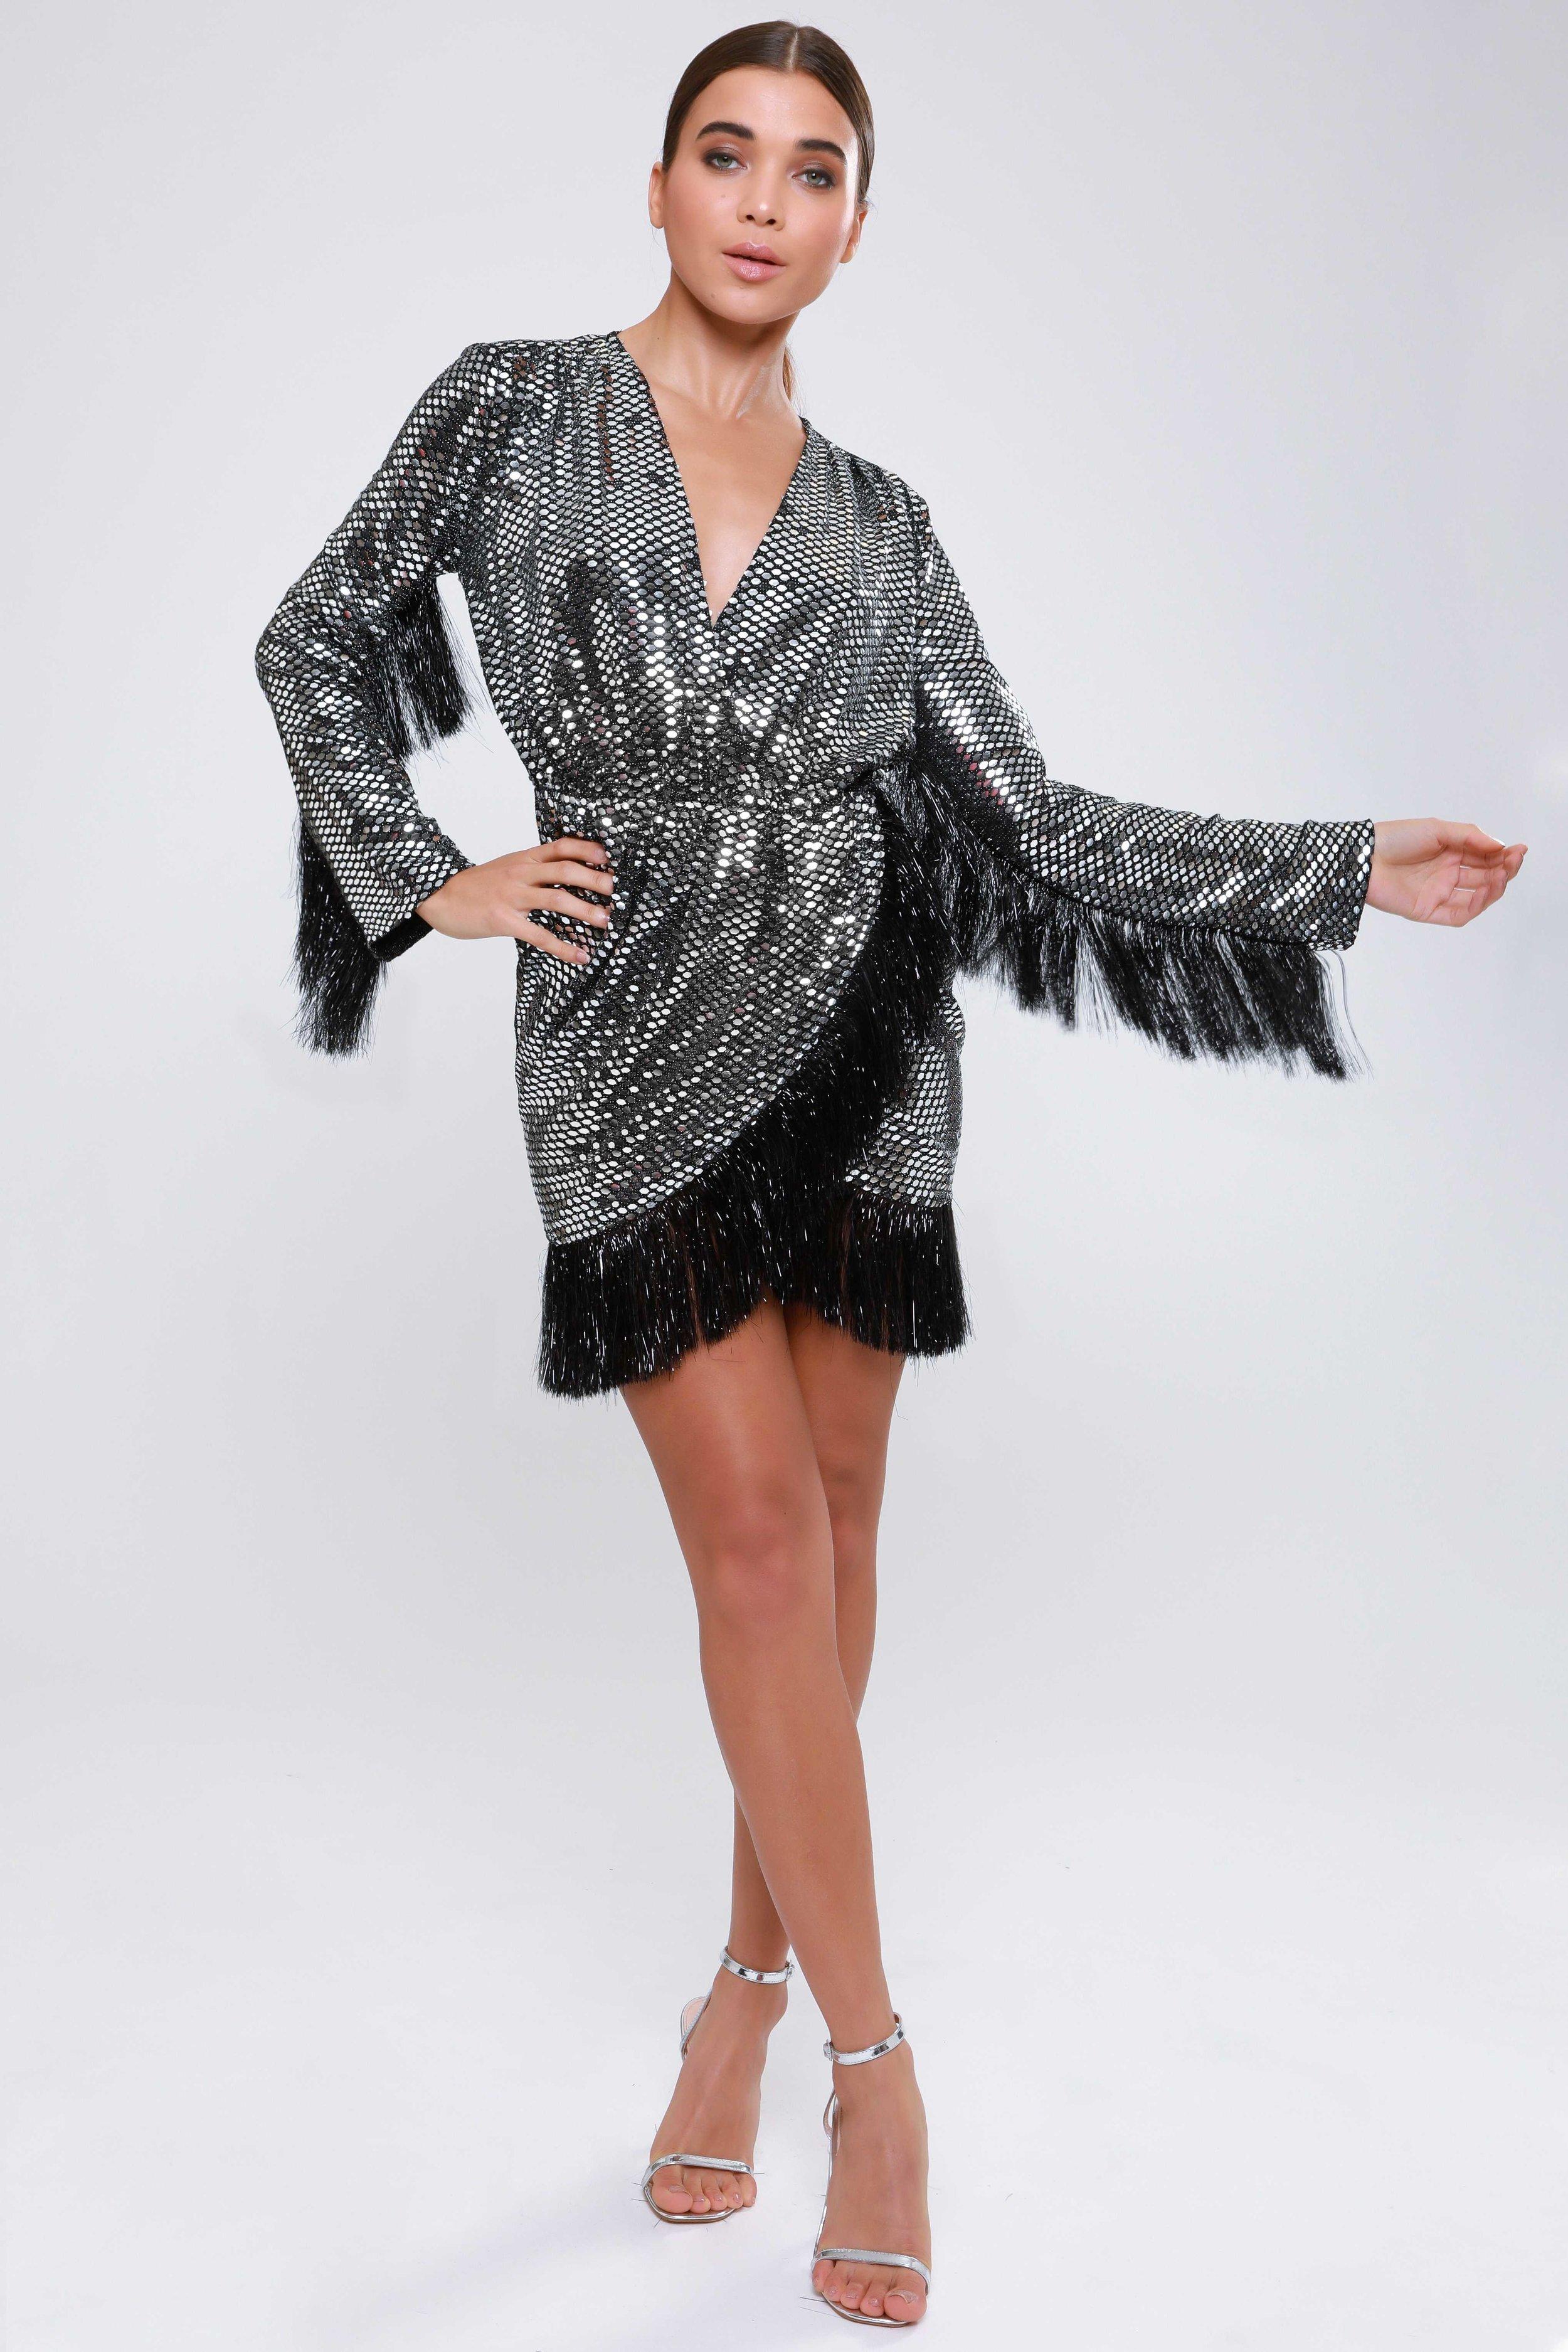 Mirrored Metallic  Wrap Dress   £75.00